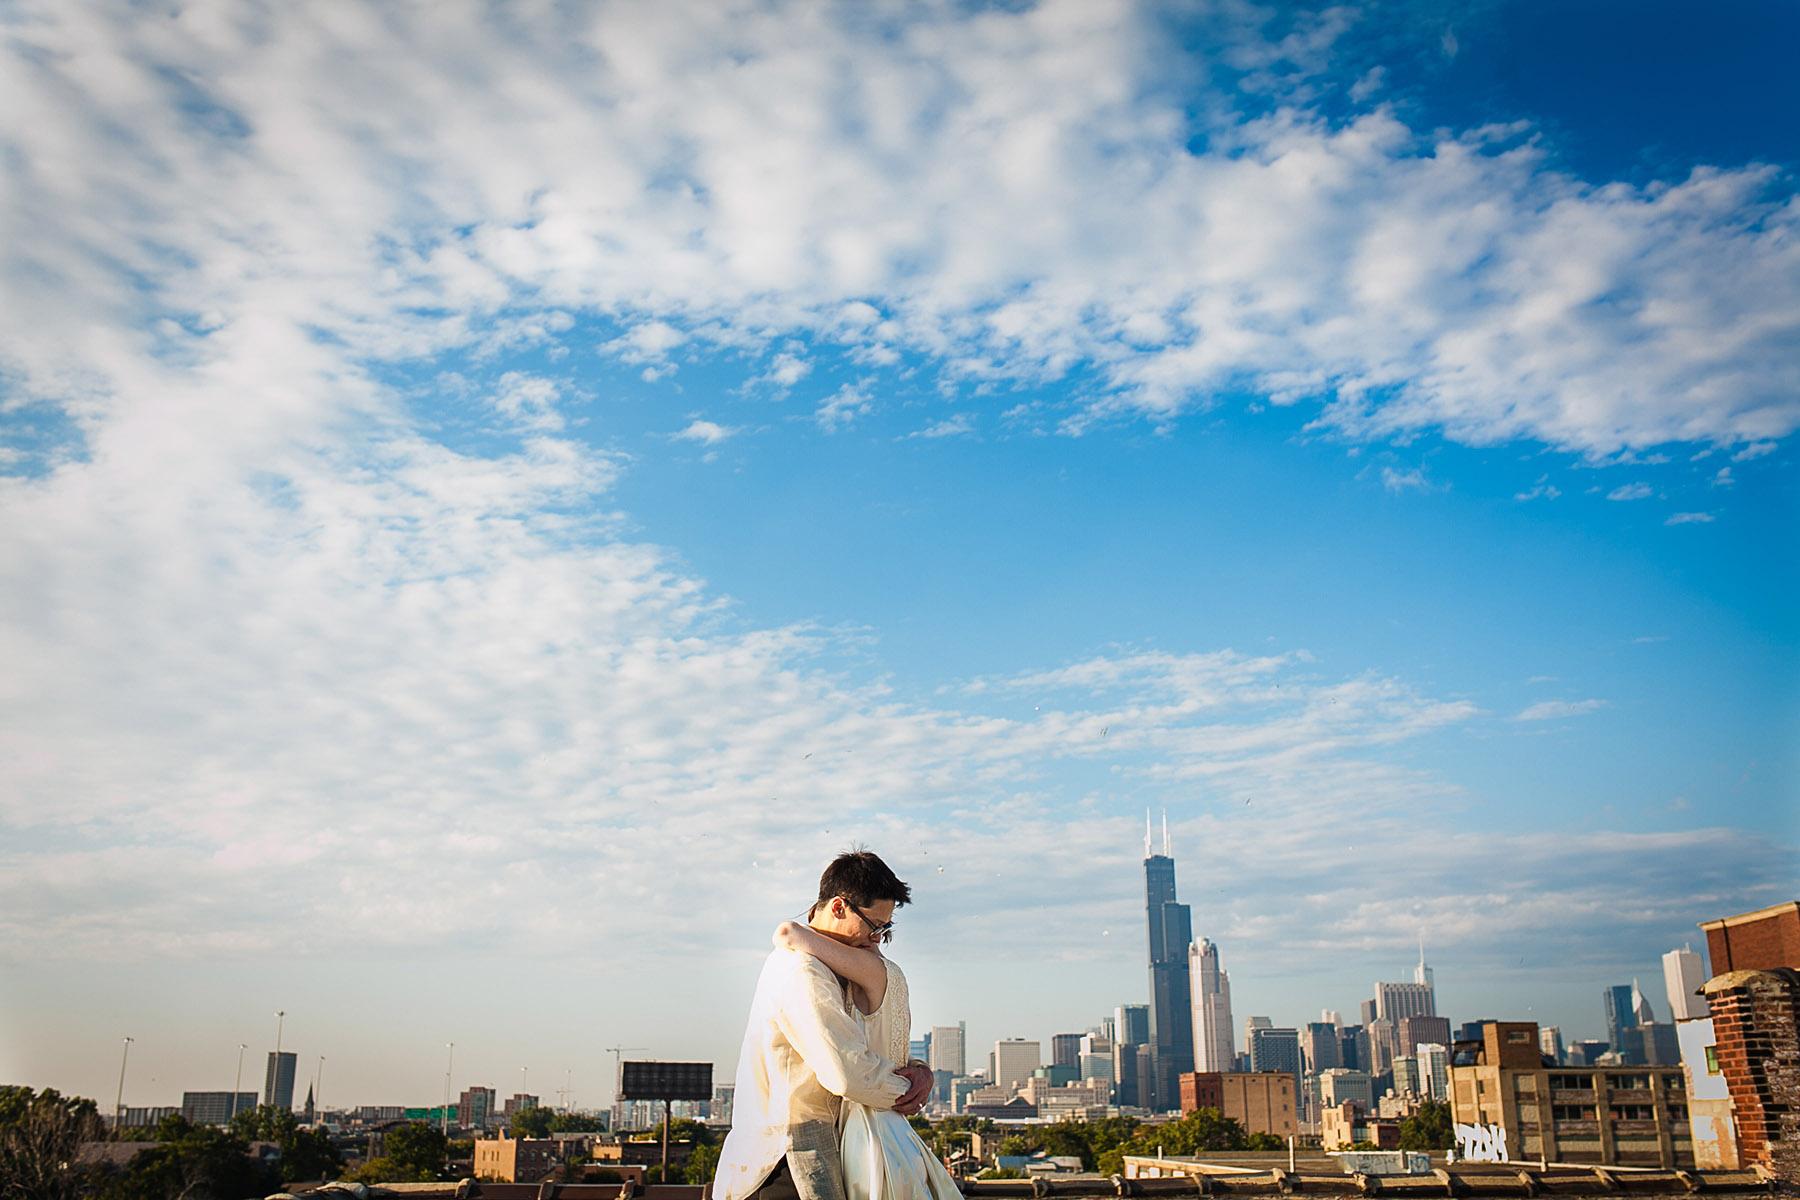 st-hegwig-chicago-urban-arts-society-terrarium-inspired-wedding-documentary-wedding-photography-oriana-koren-51.jpg